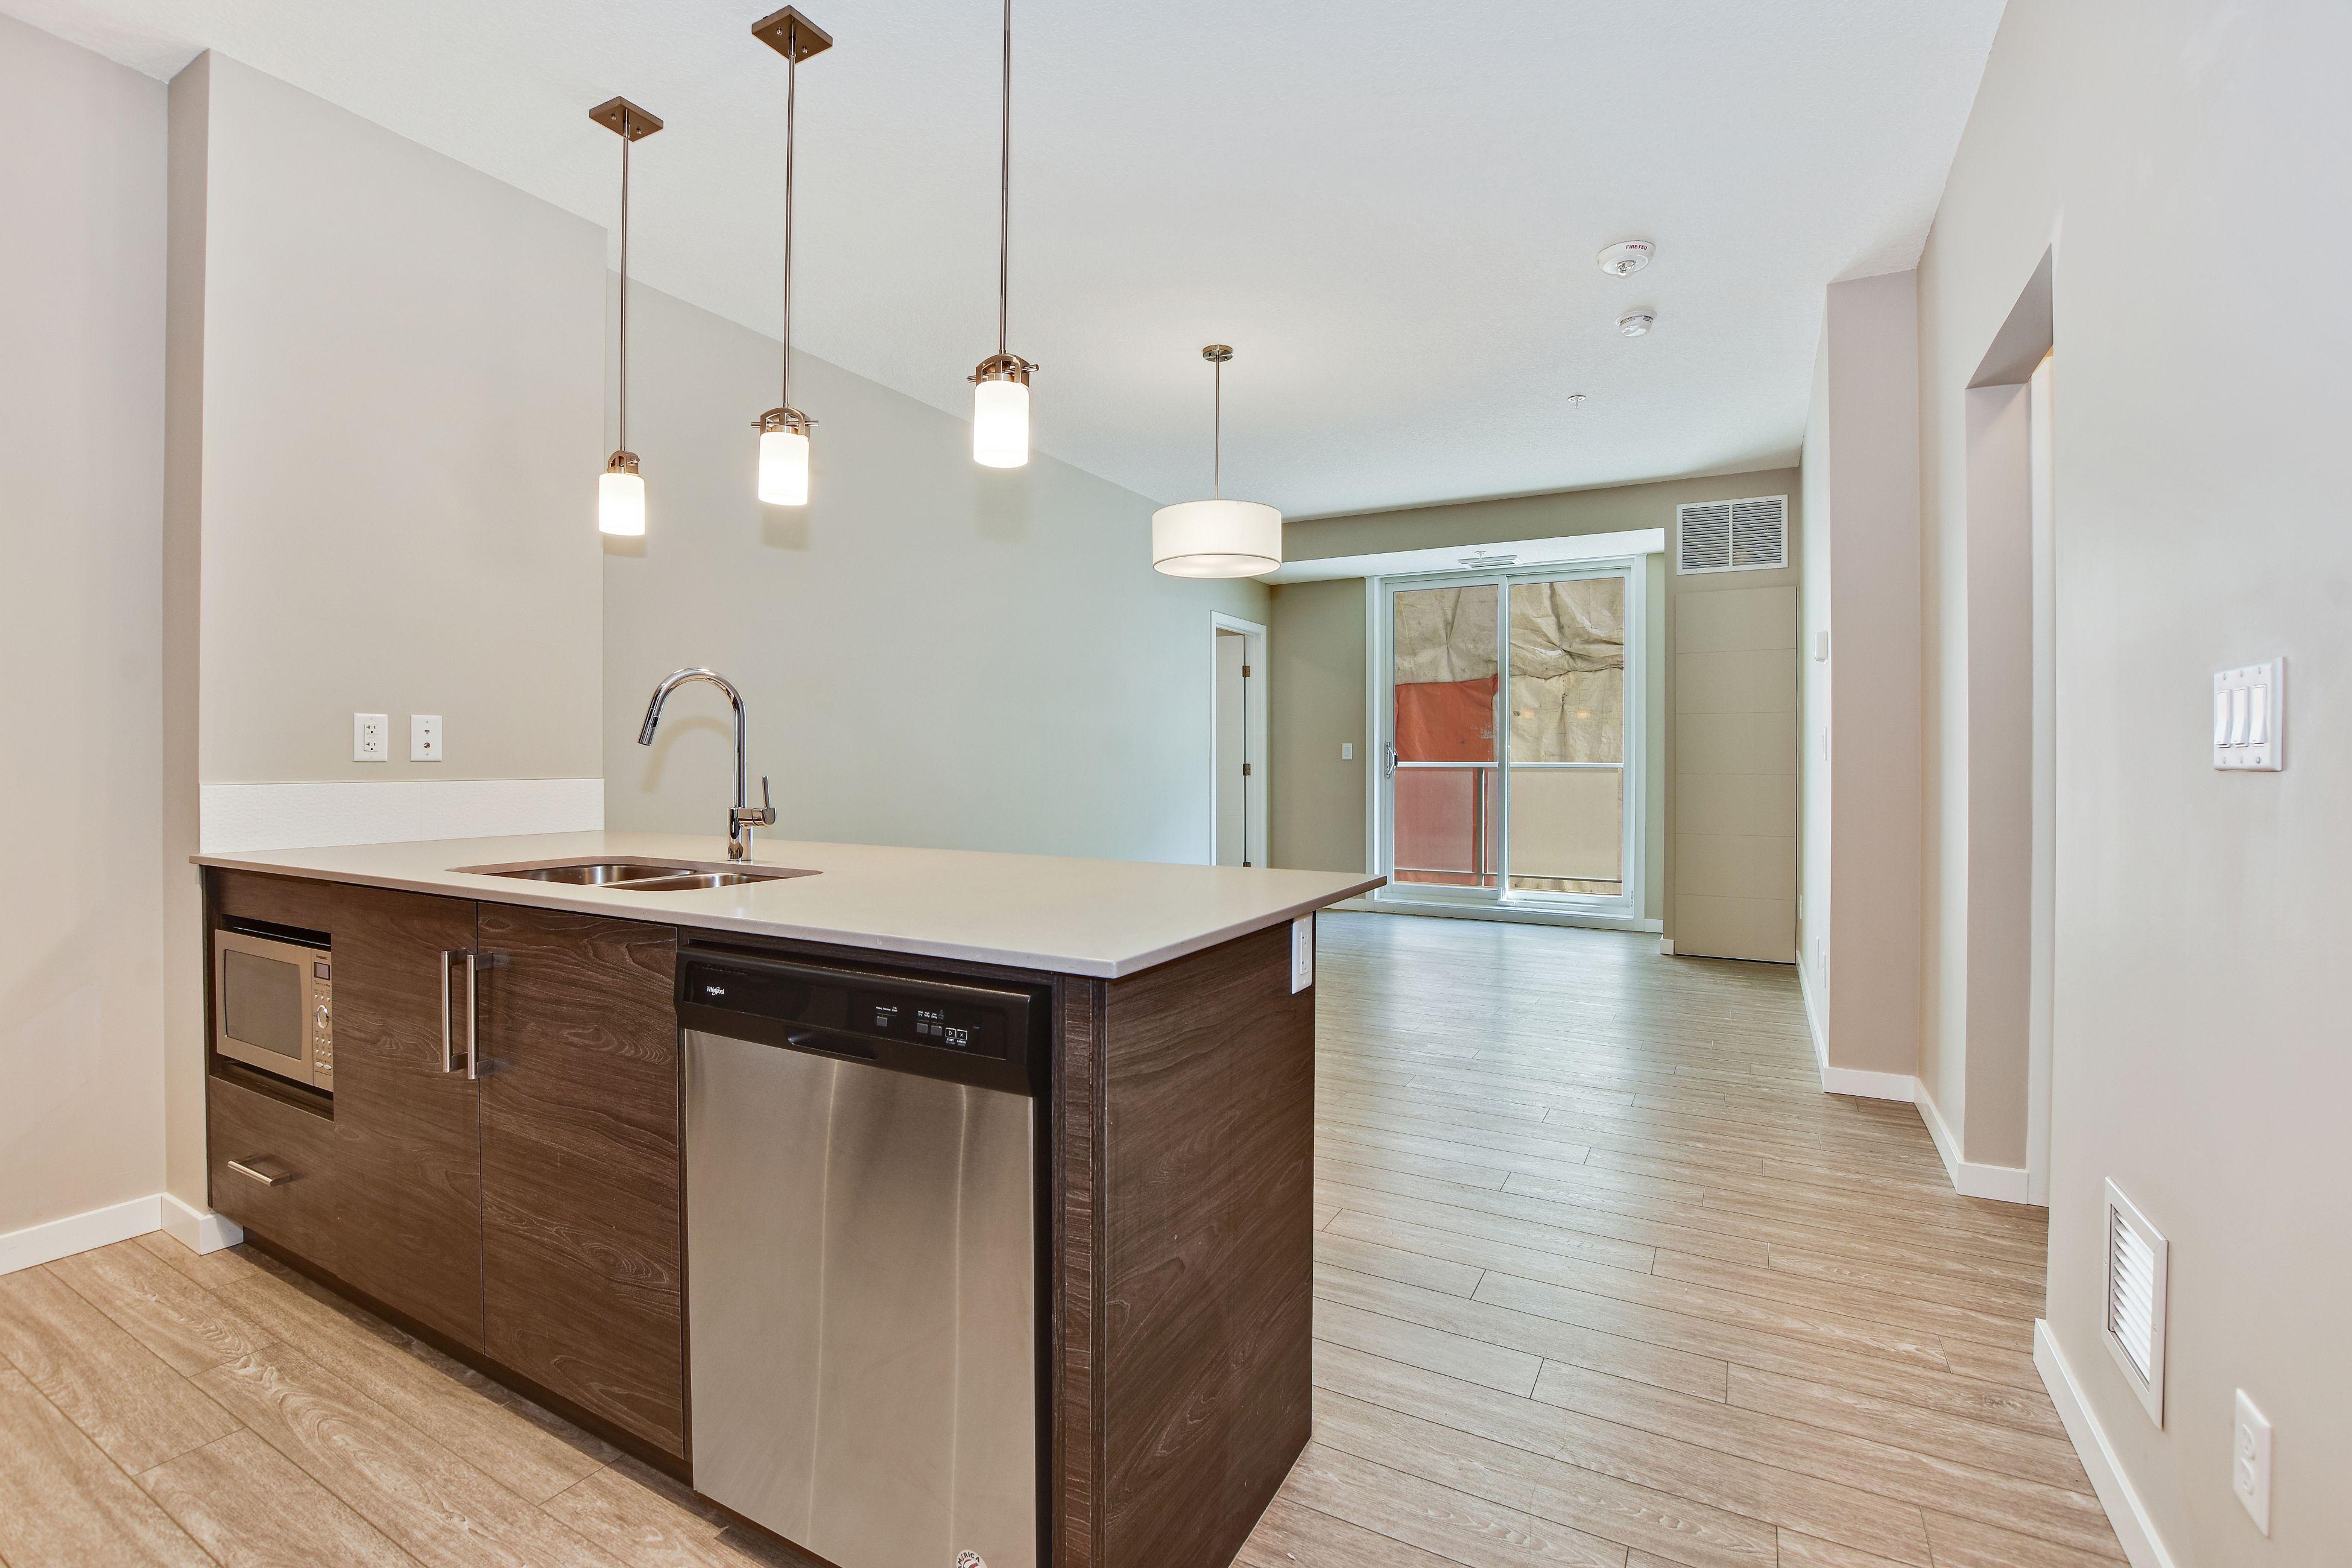 218, 121 Mahogany Centre SE, Calgary, Alberta T3M 3A4, 1 Bedroom Bedrooms, ,1 BathroomBathrooms,Apartment,For Rent,Lyric,Mahogany Centre SE,218,1055